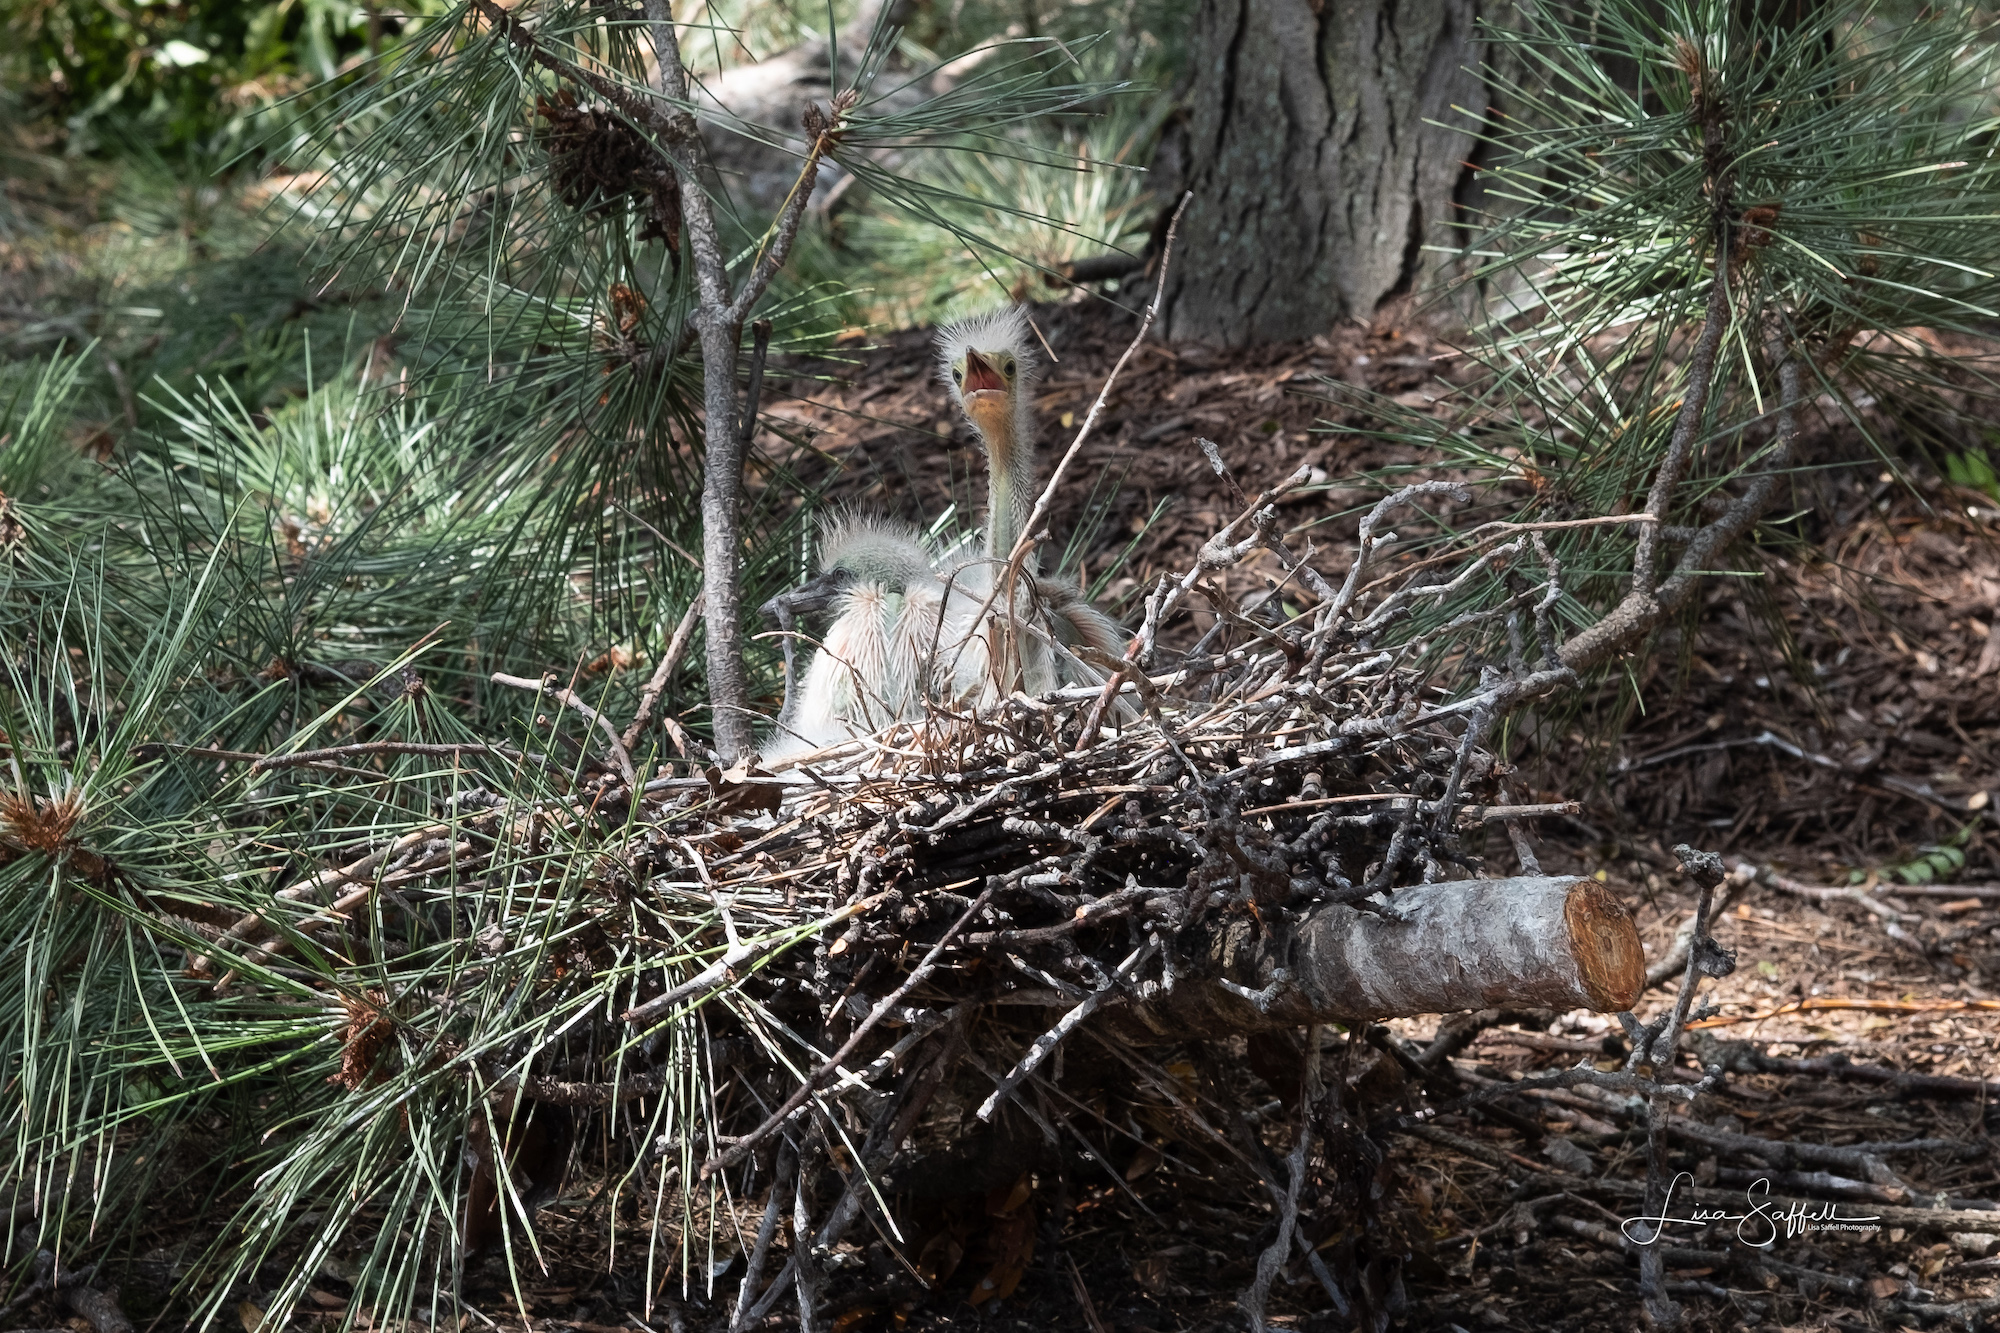 St. Louis heron rookery